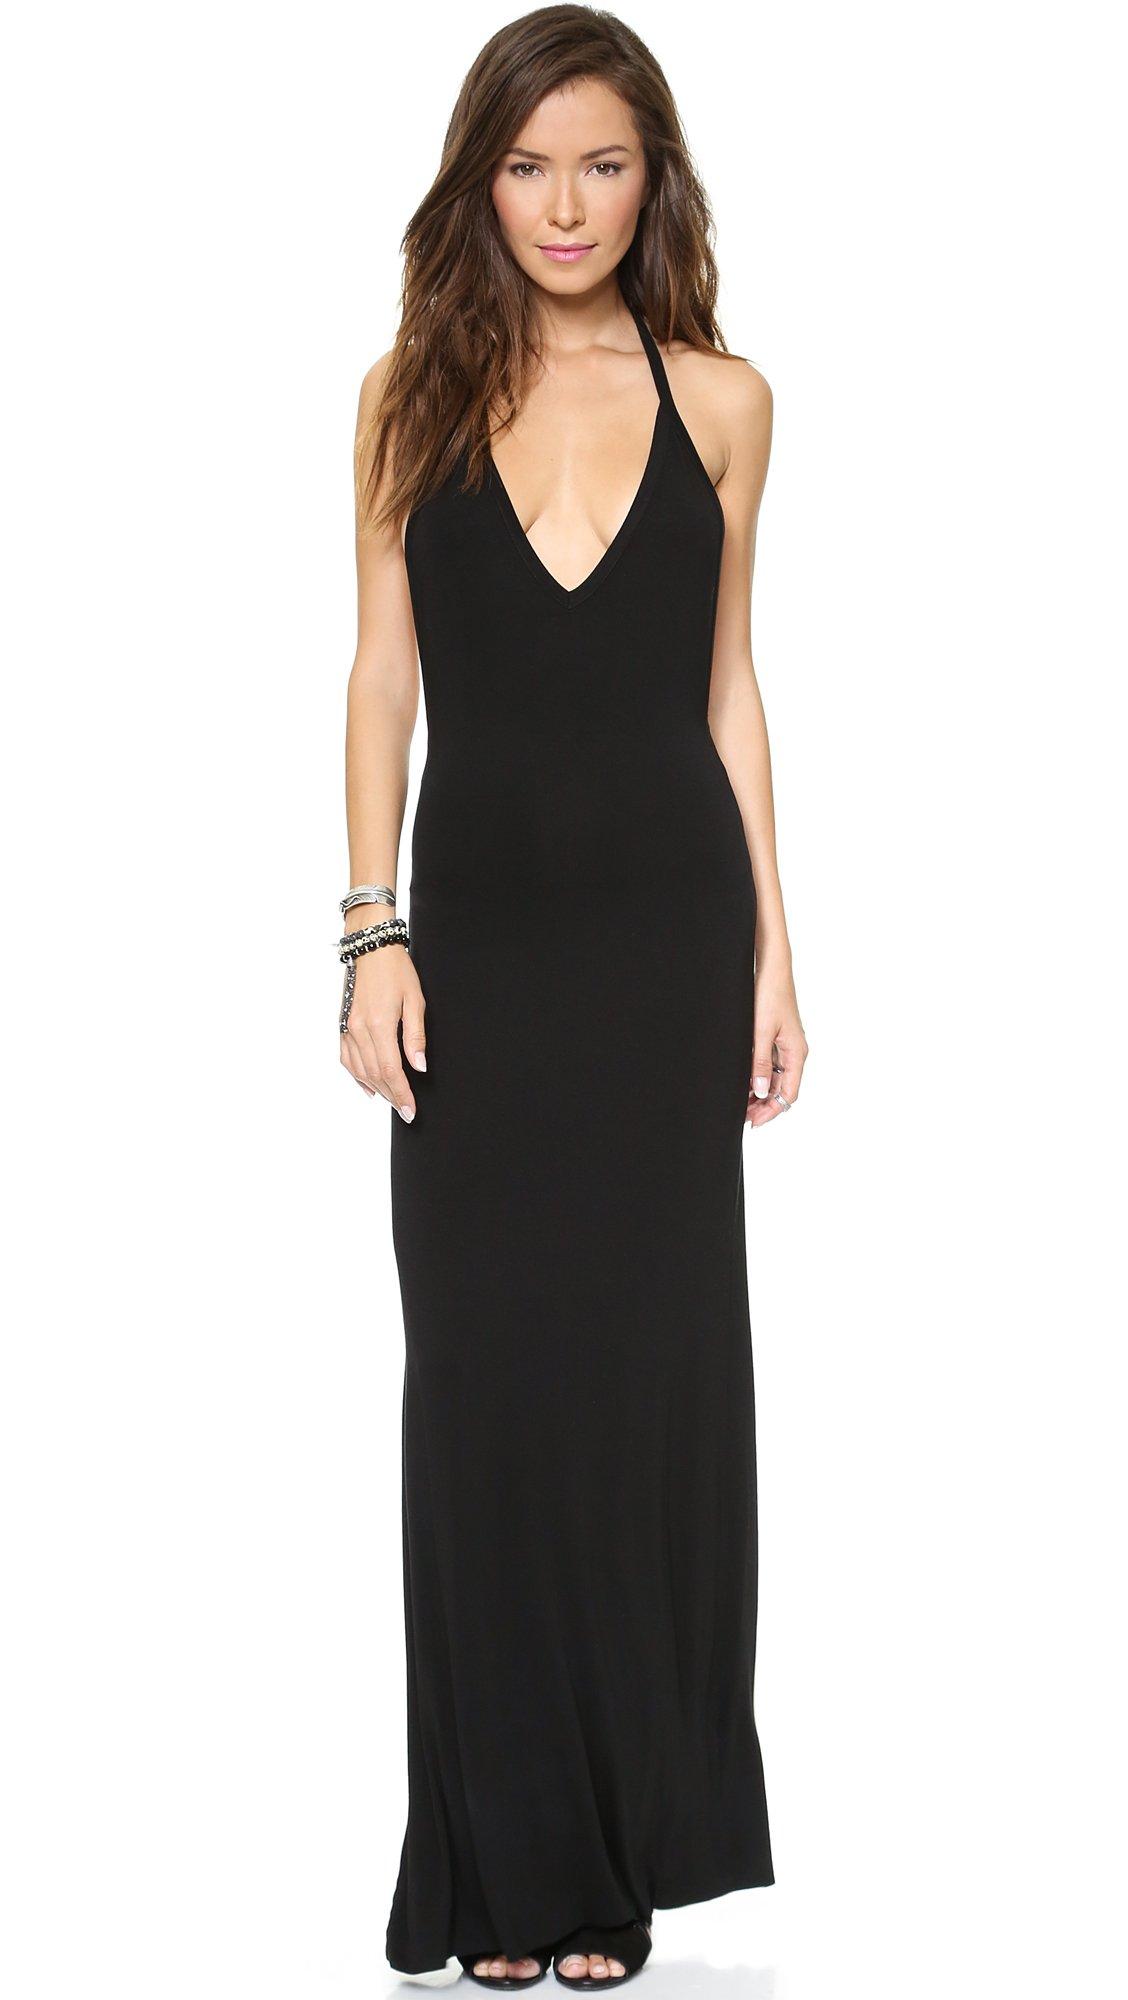 Lyst Young Fabulous Broke Archer Maxi Dress Black In Black